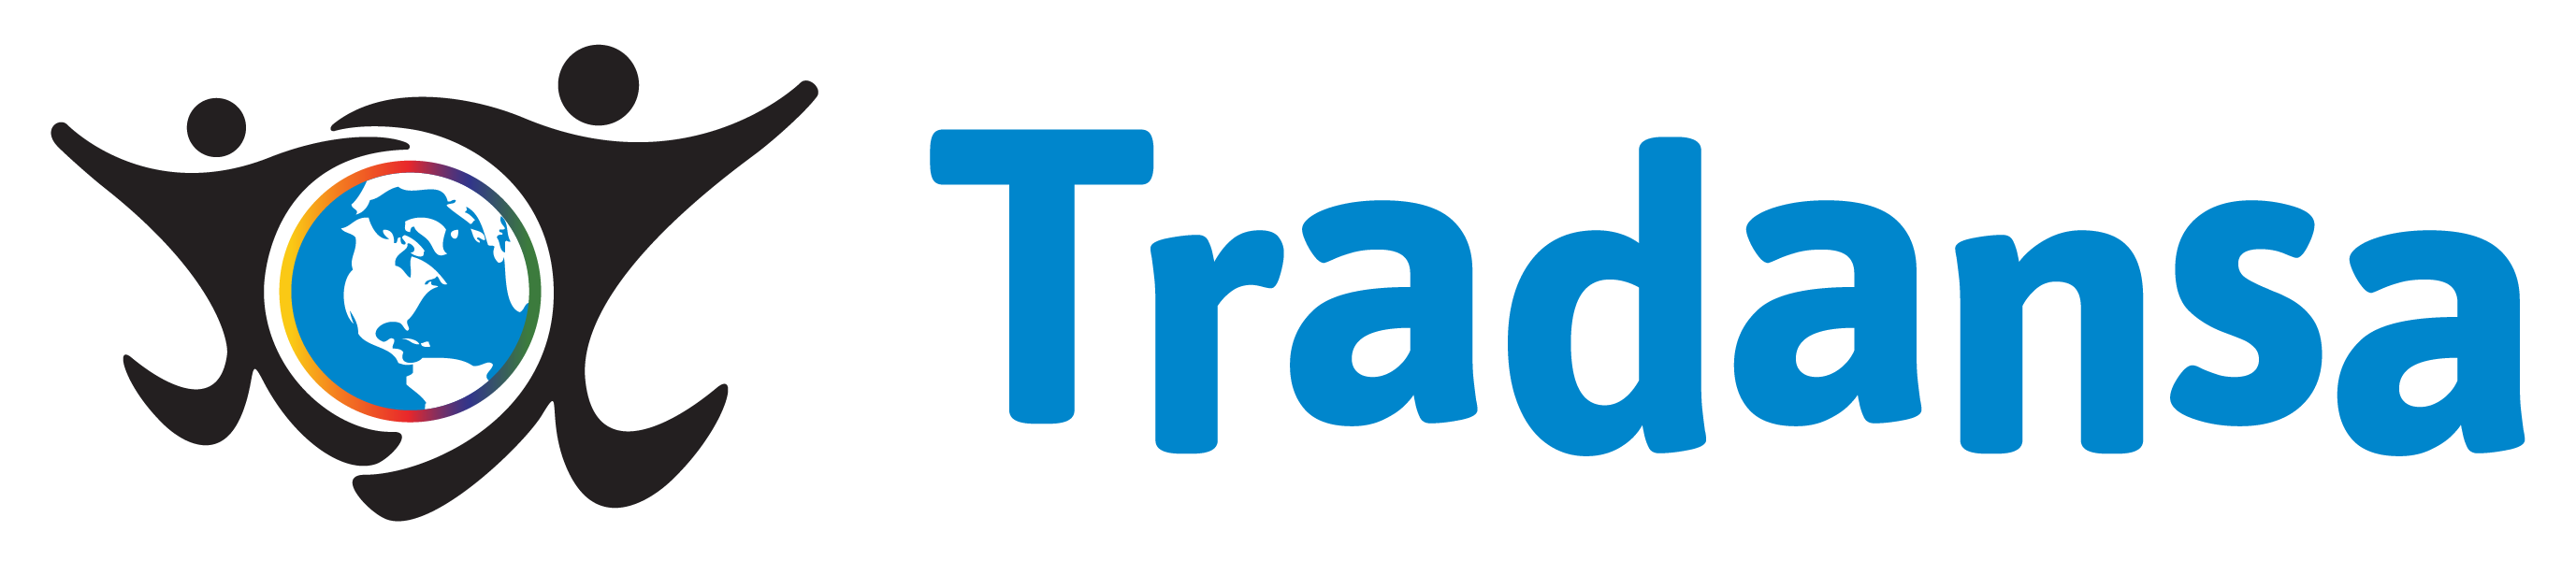 Tradansa